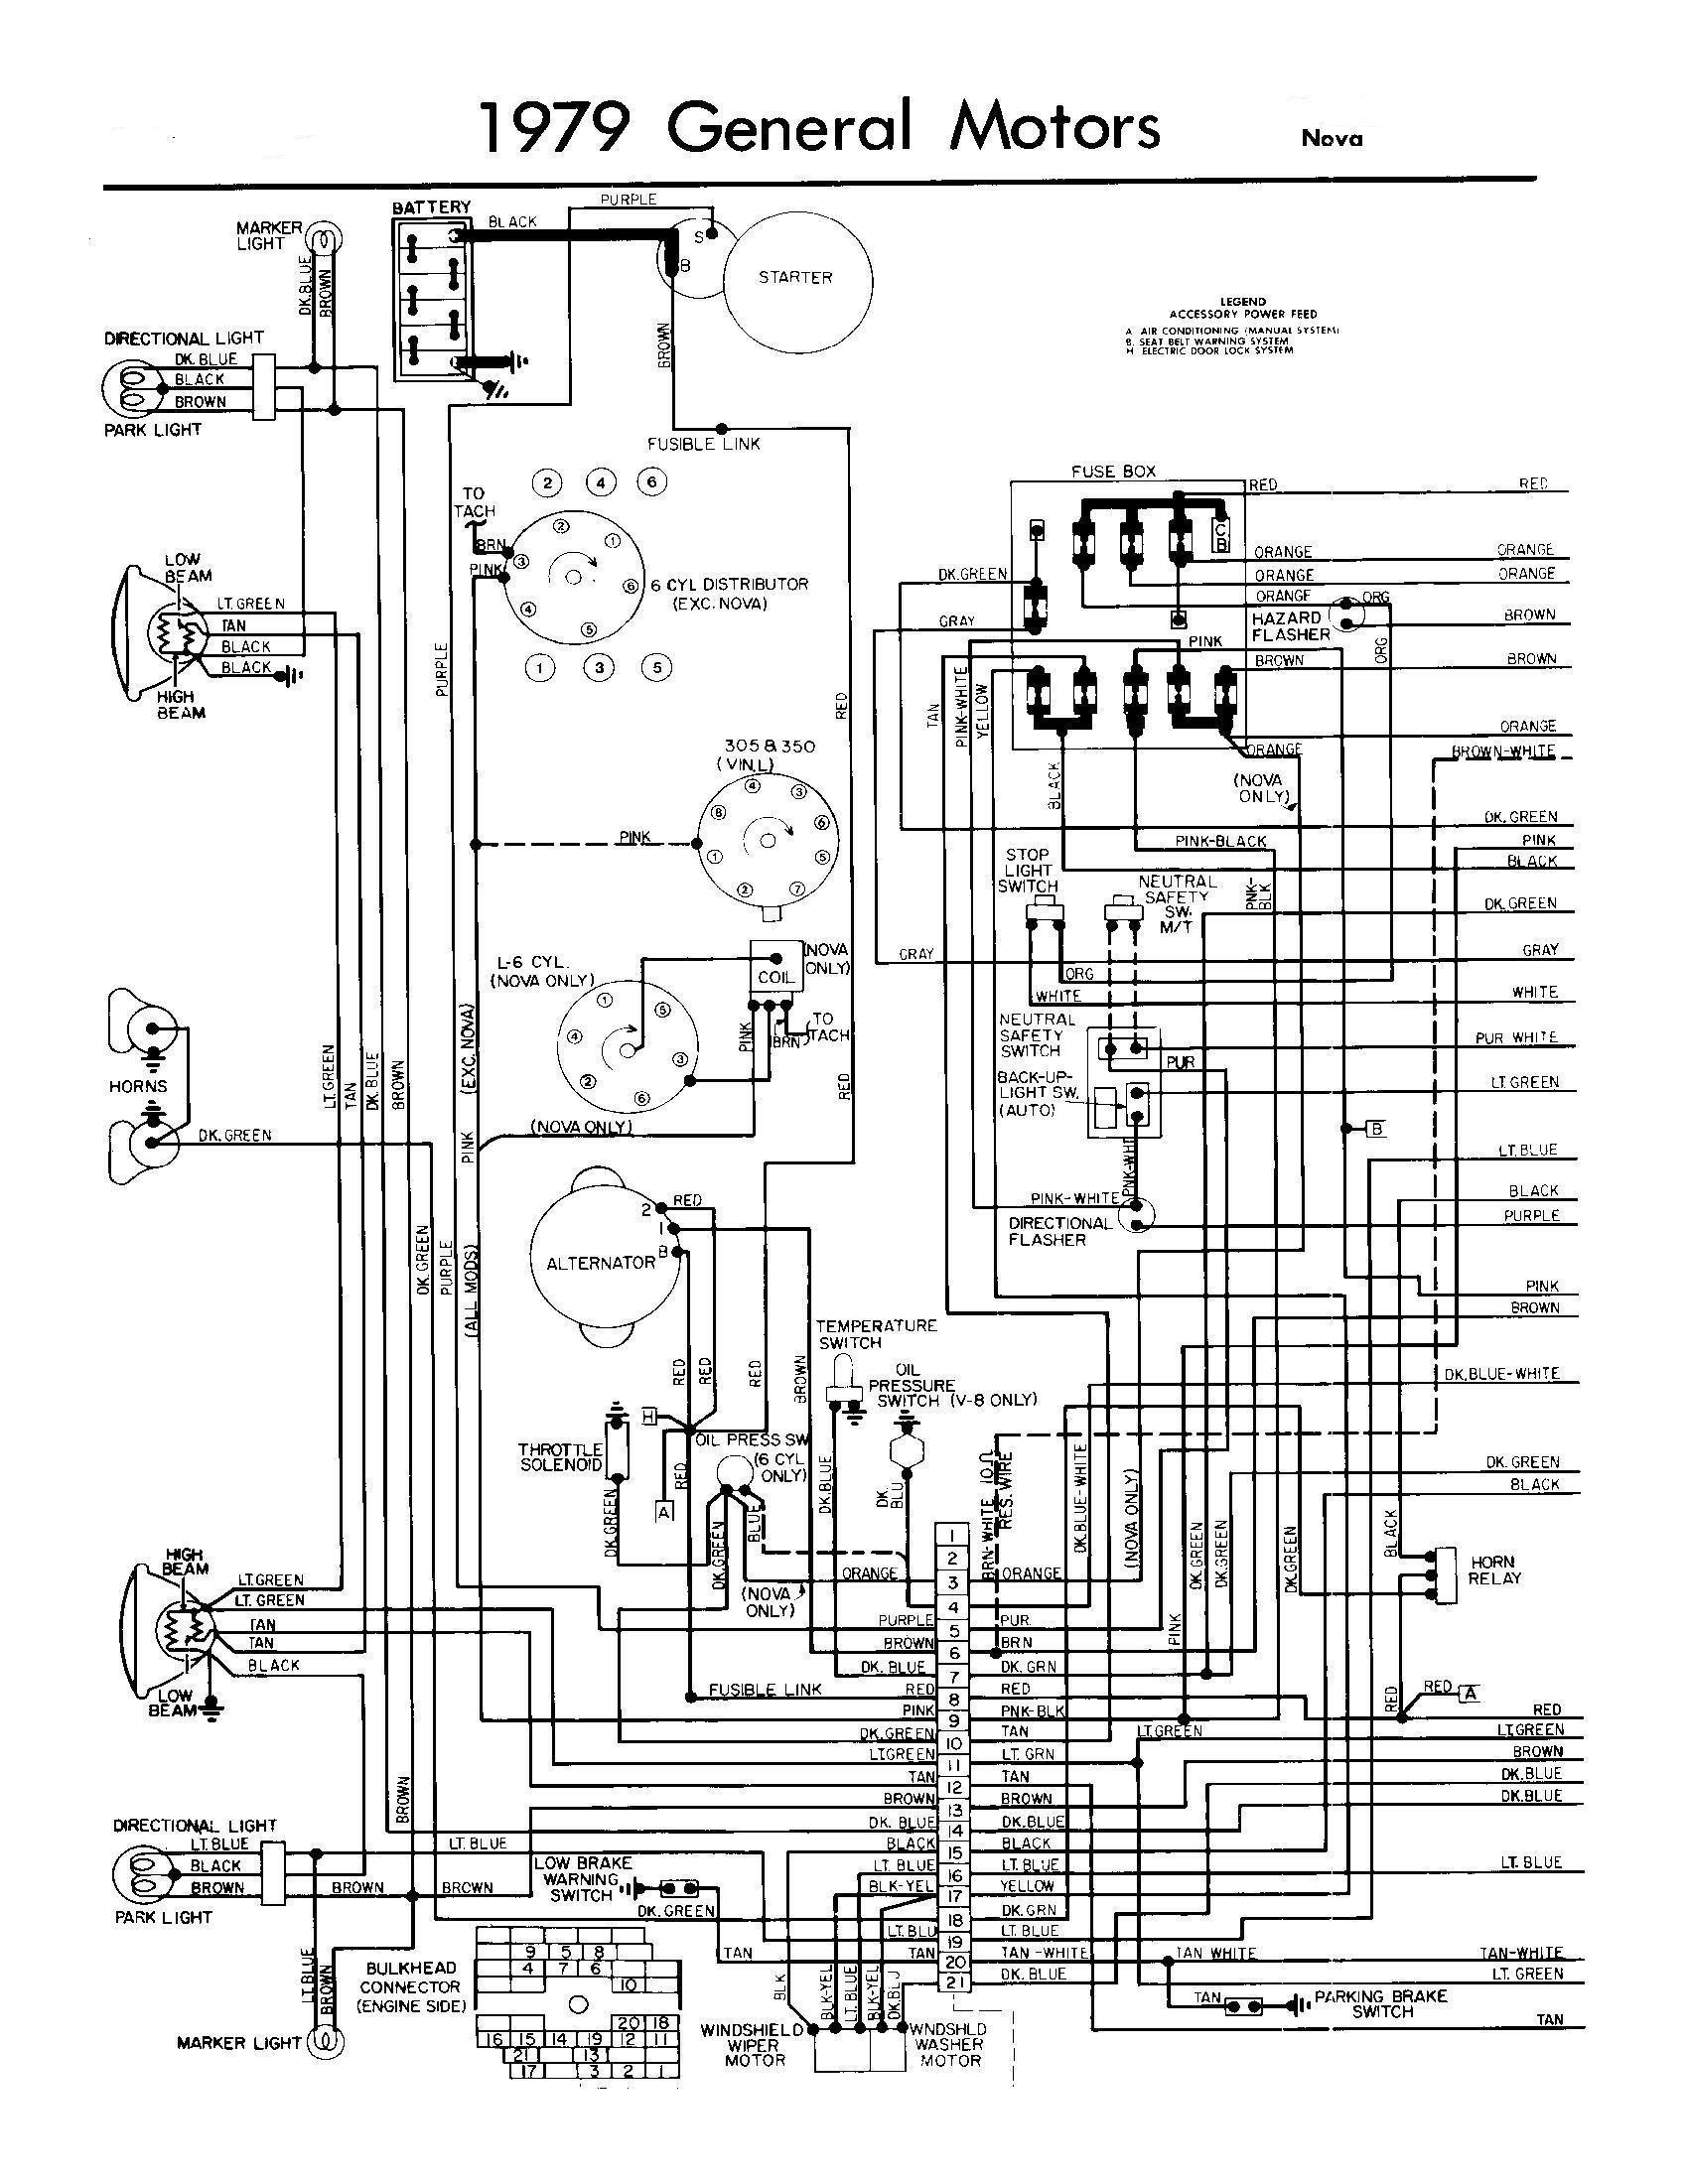 Ignition Switch Wiring Diagram Chevy All Generation Wiring Schematics Chevy  Nova forum Of Ignition Switch Wiring